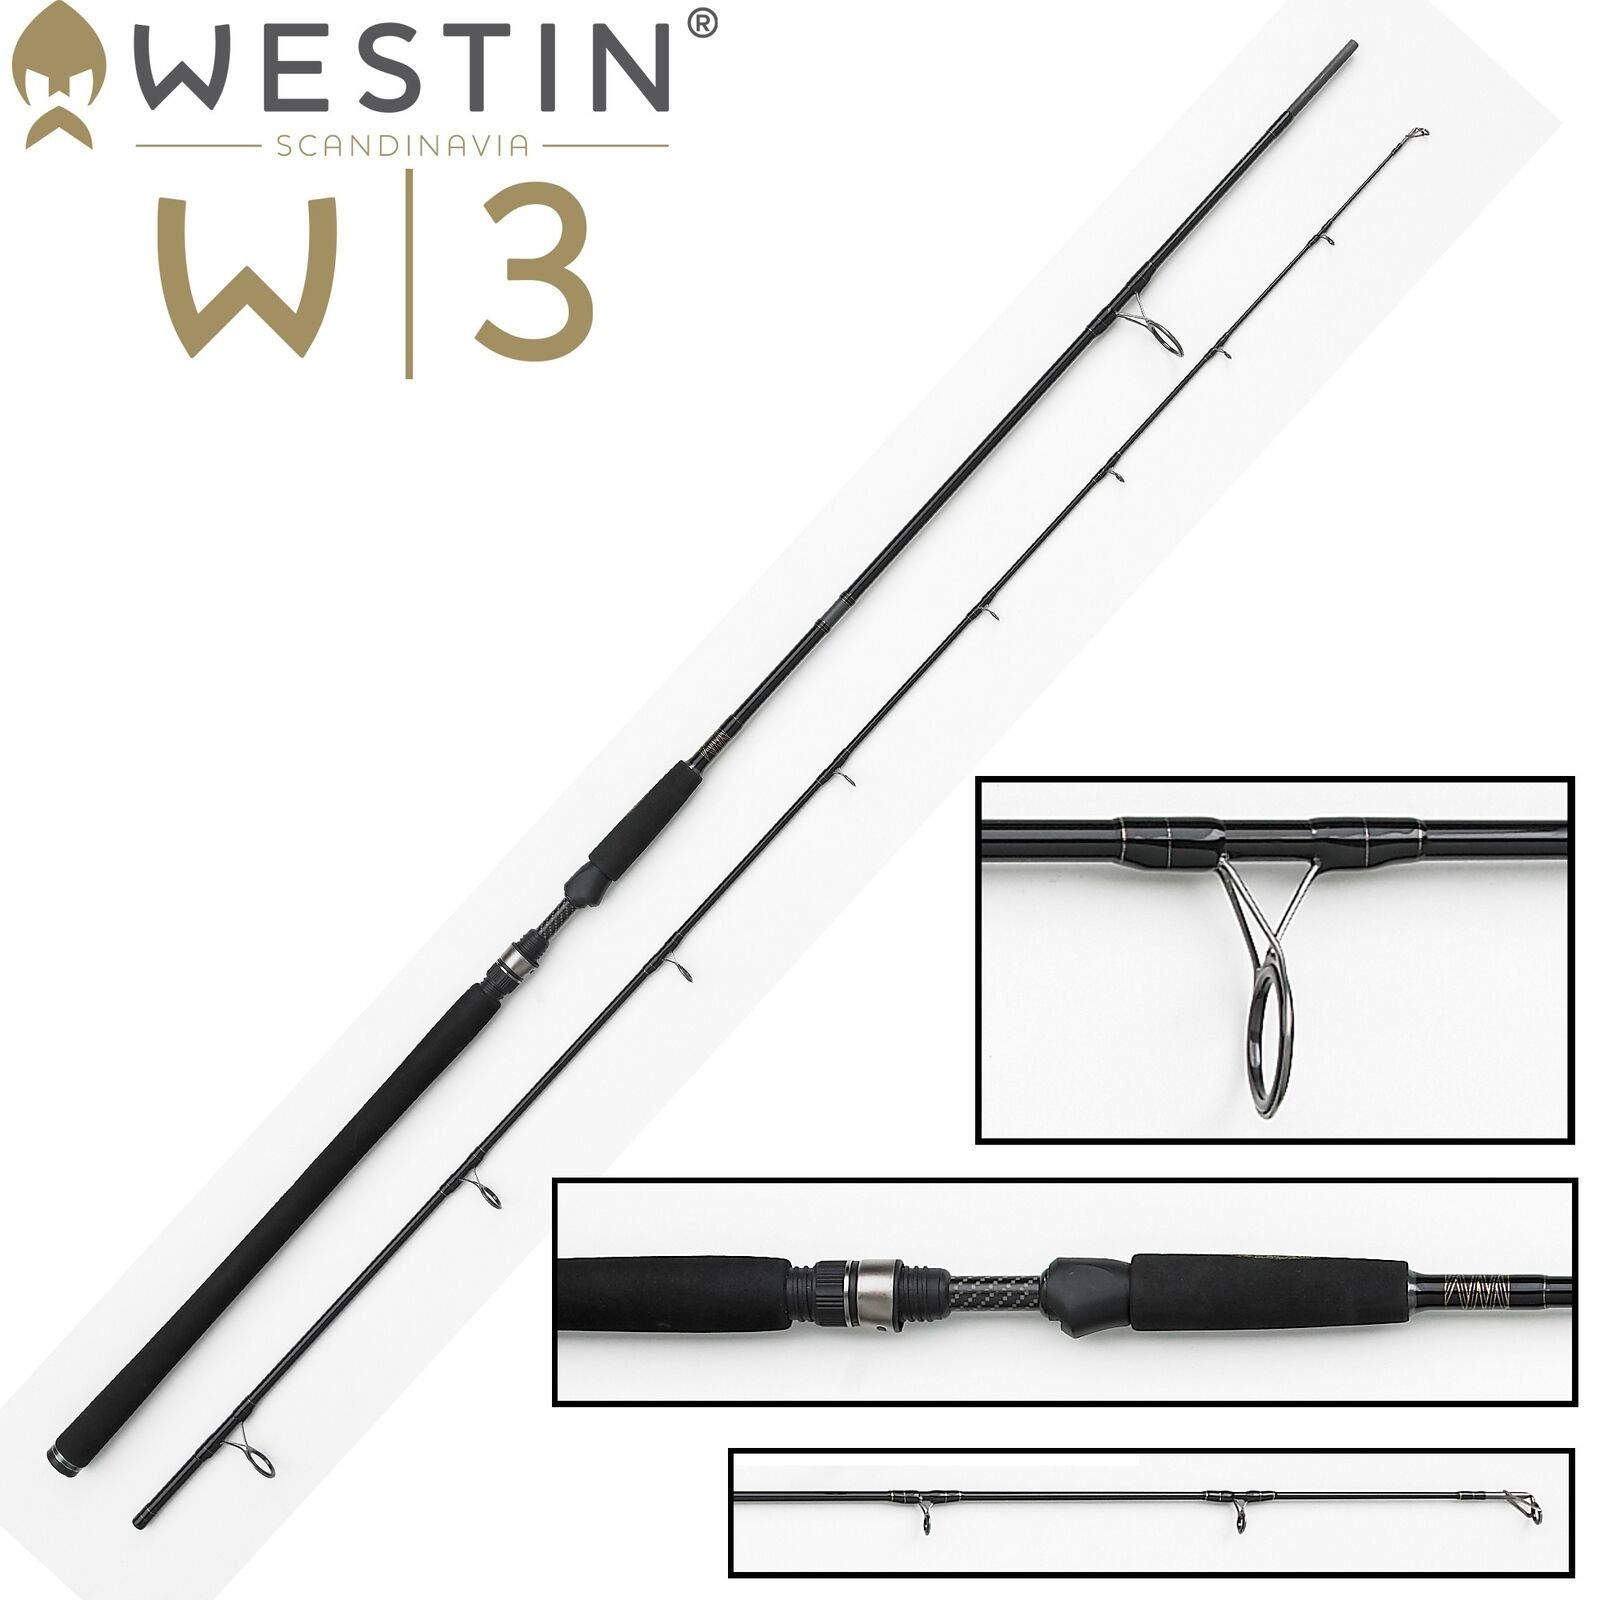 Westin W3 Powercast 251cm XXH 40-130g Spinnrute zum Hechtangeln, Blinkerrute